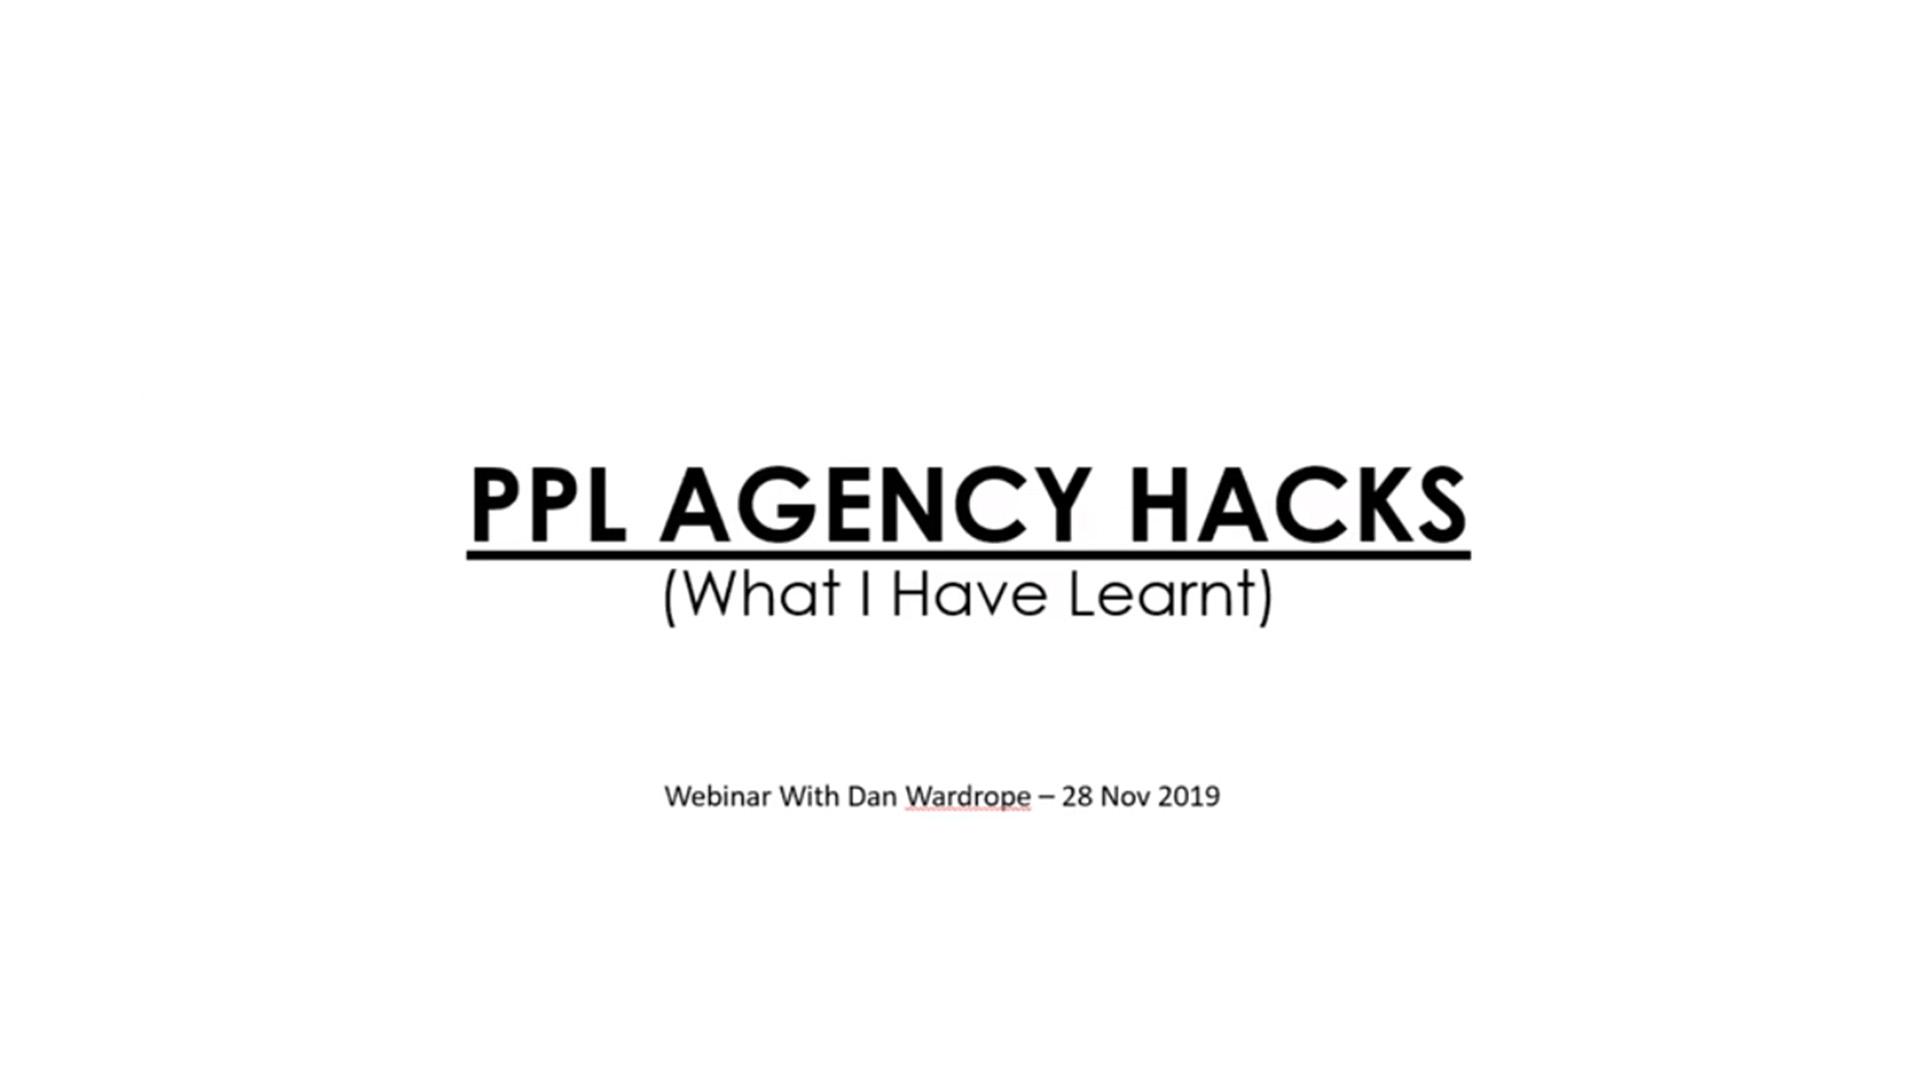 ppl agency hacks